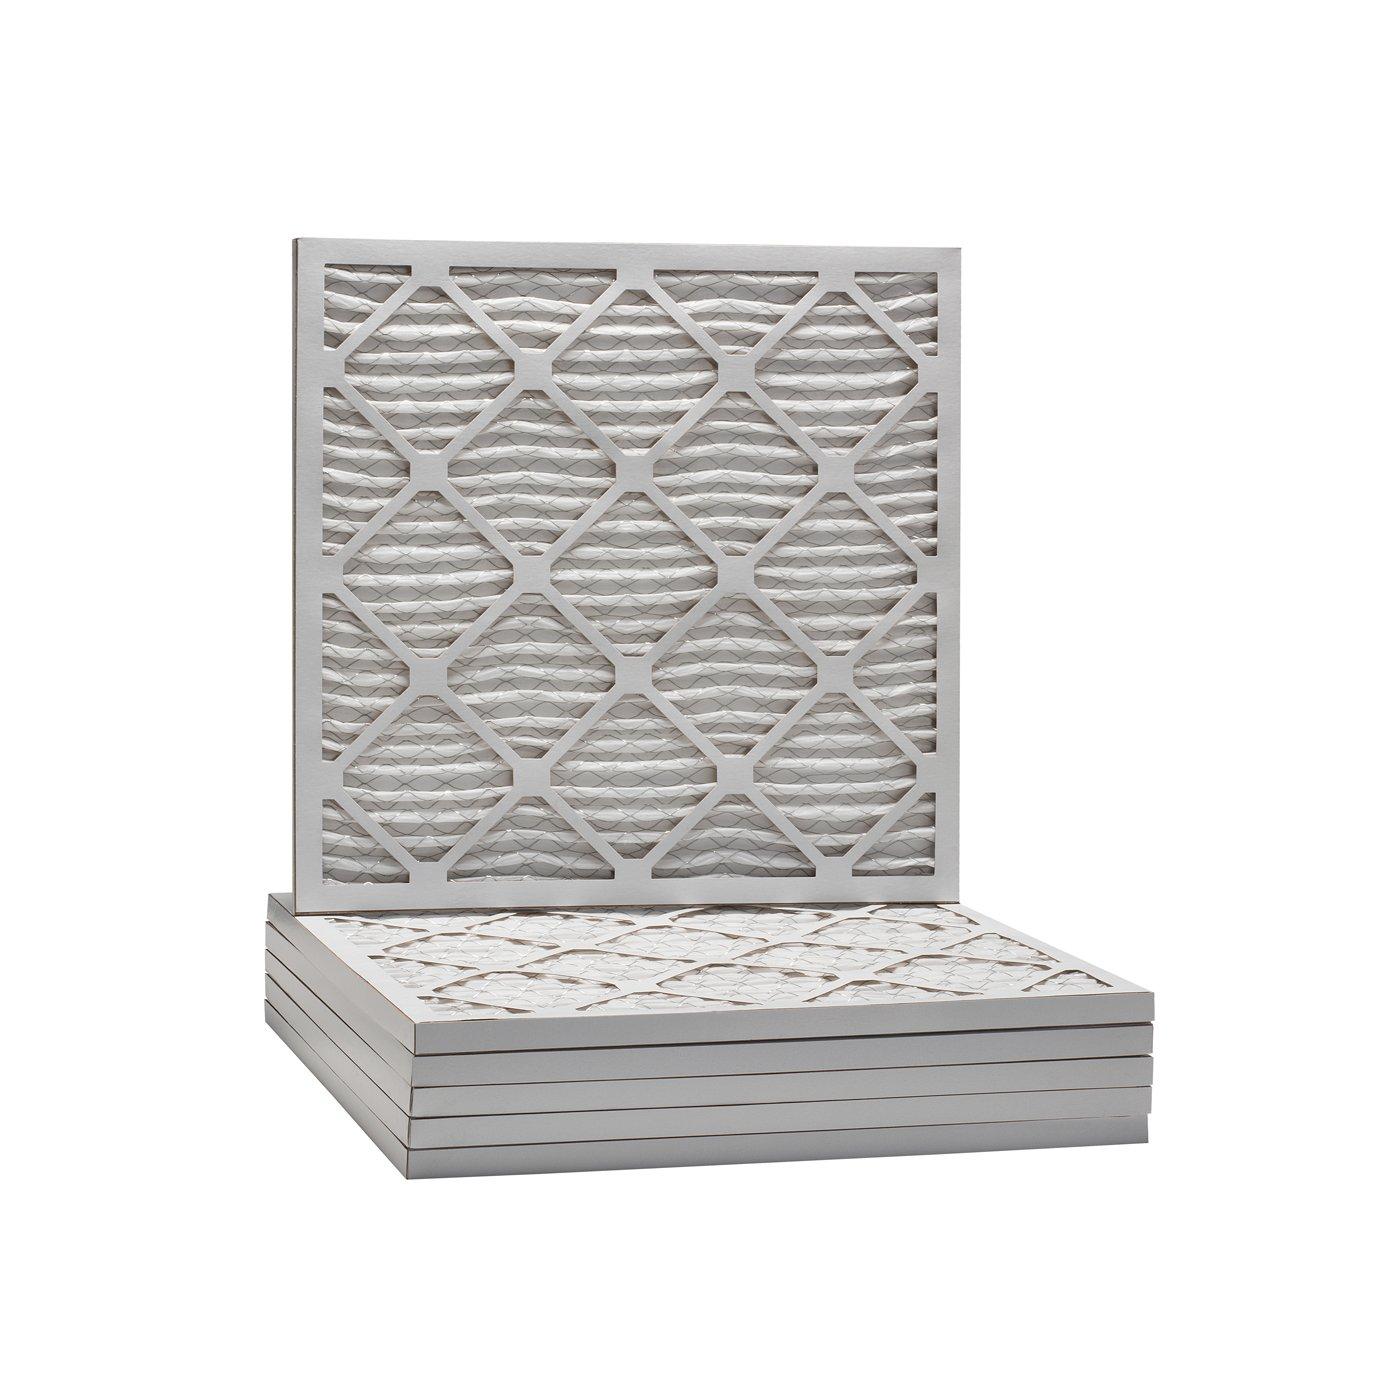 21x21x1 Premium MERV 11 Air Filter/Furnace Filter Replacement